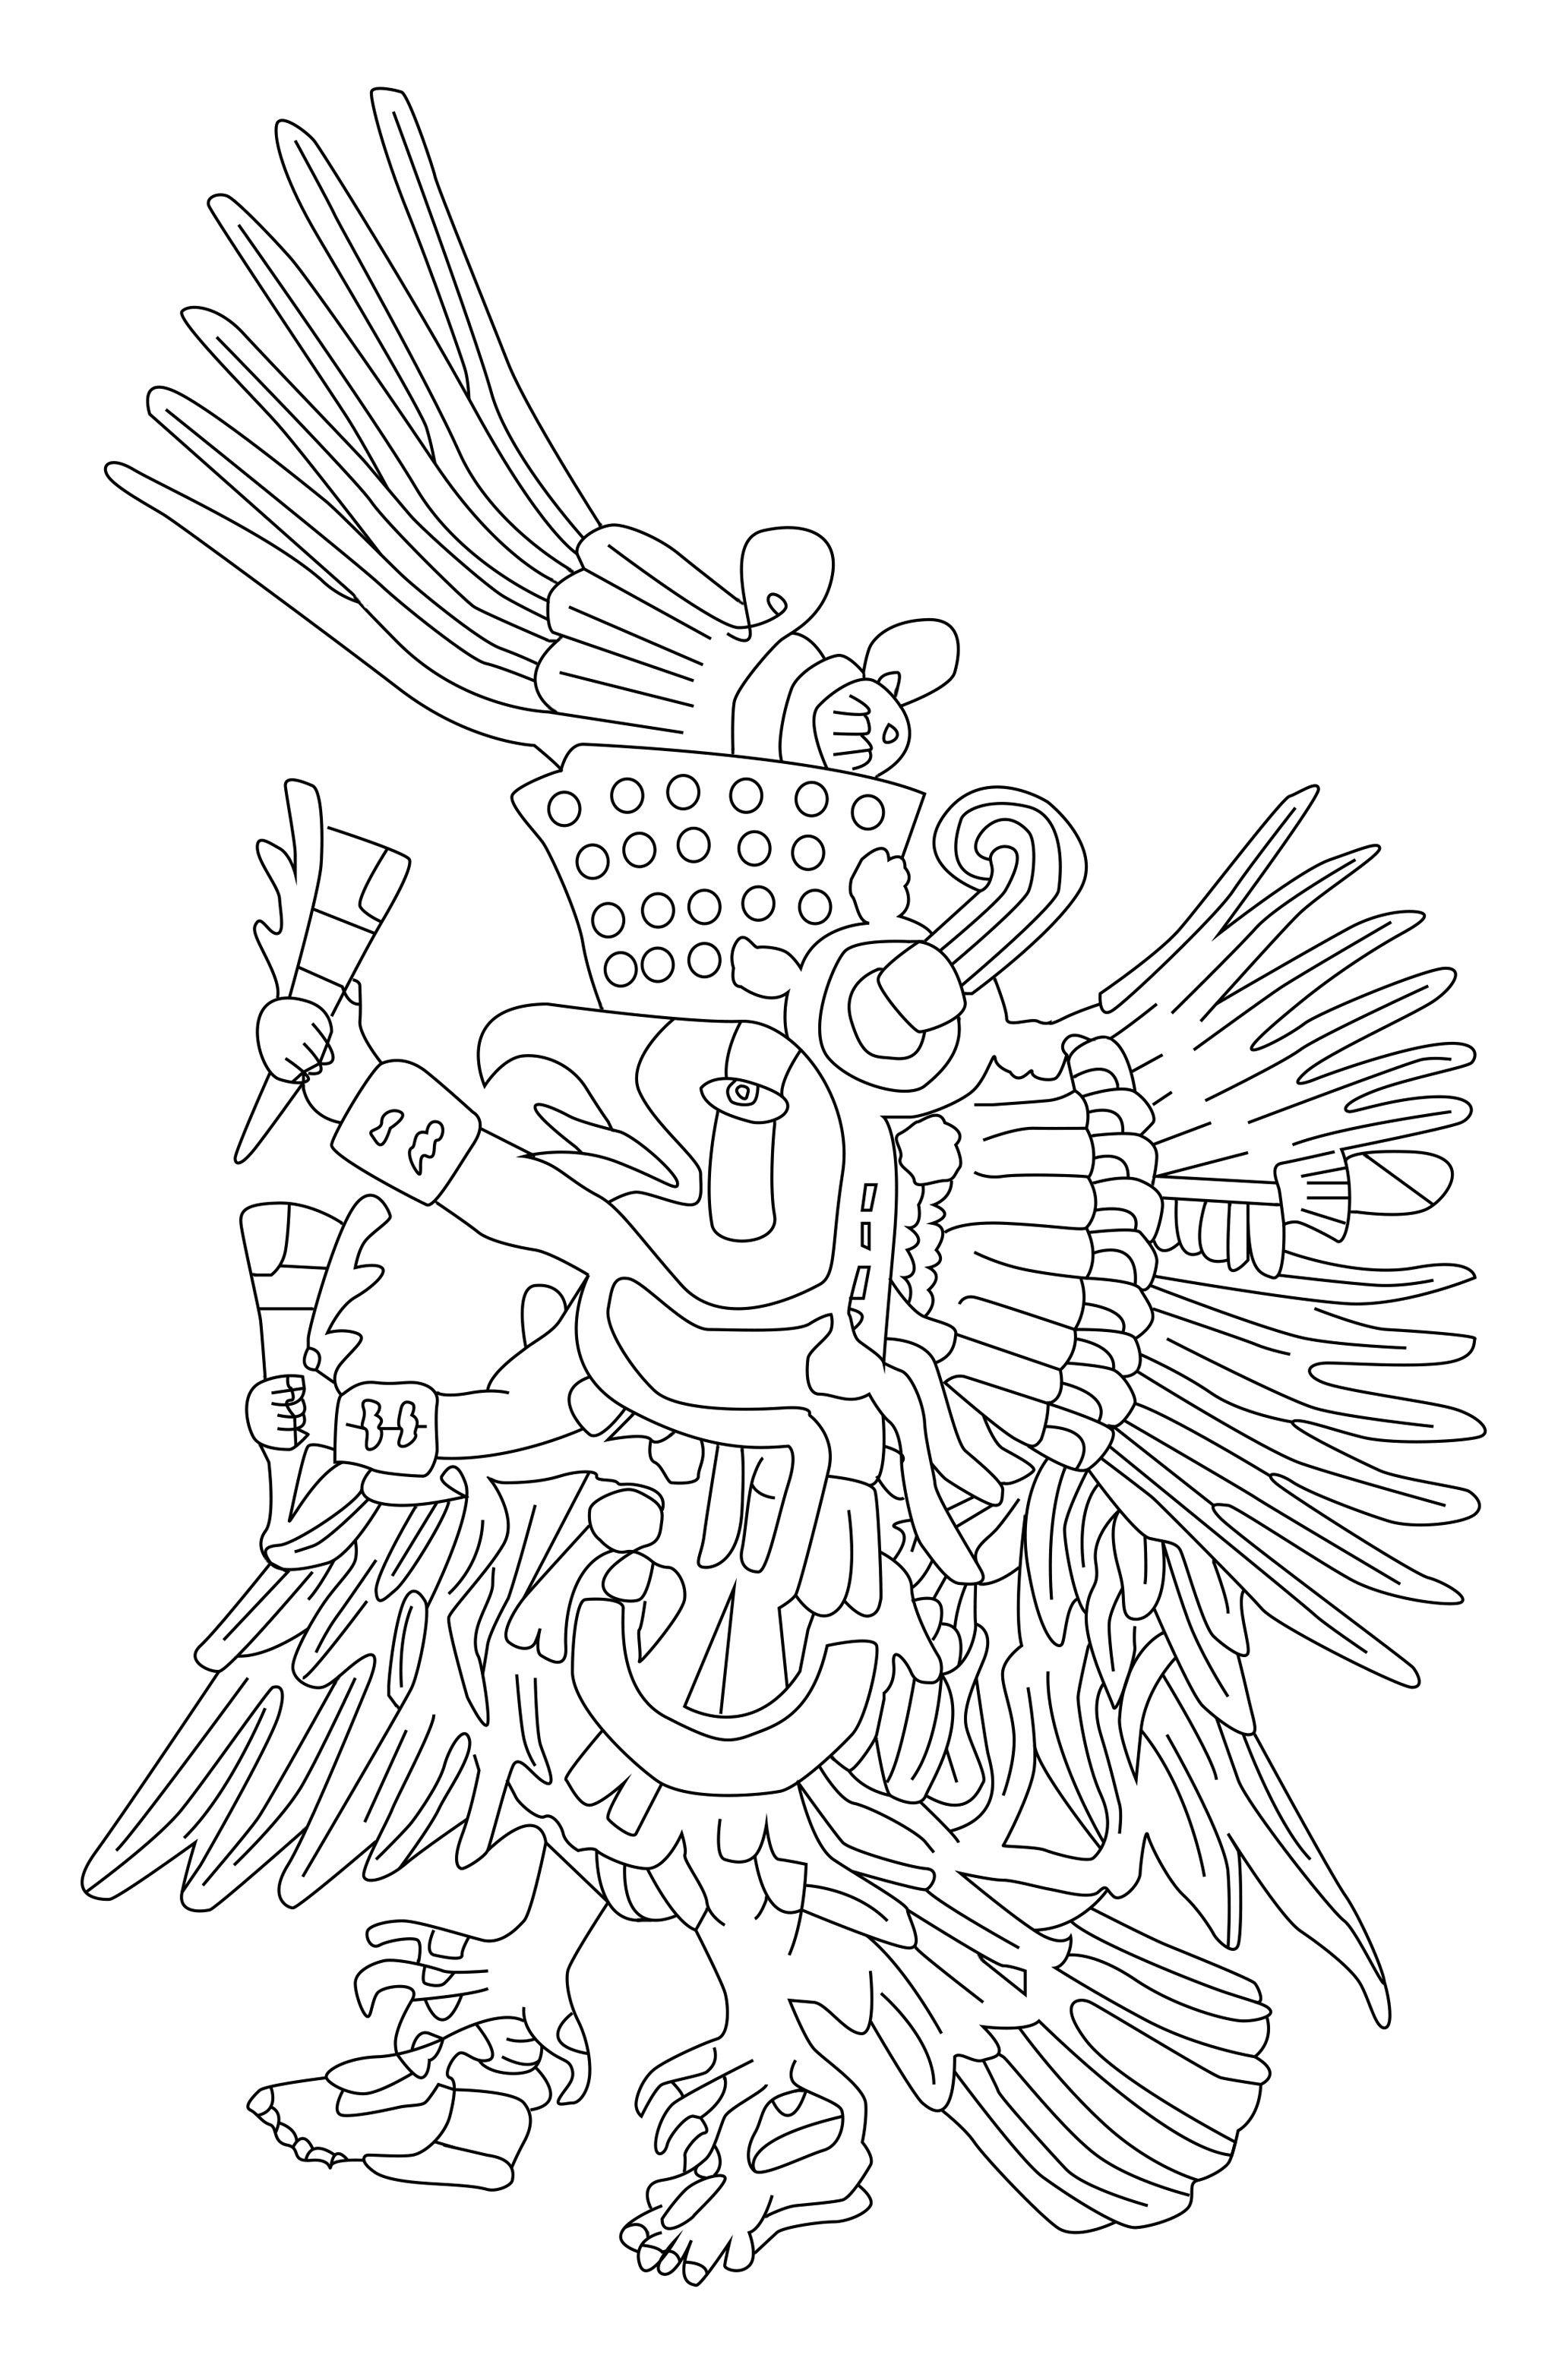 Quetzalcoatl is a Mesoamerican